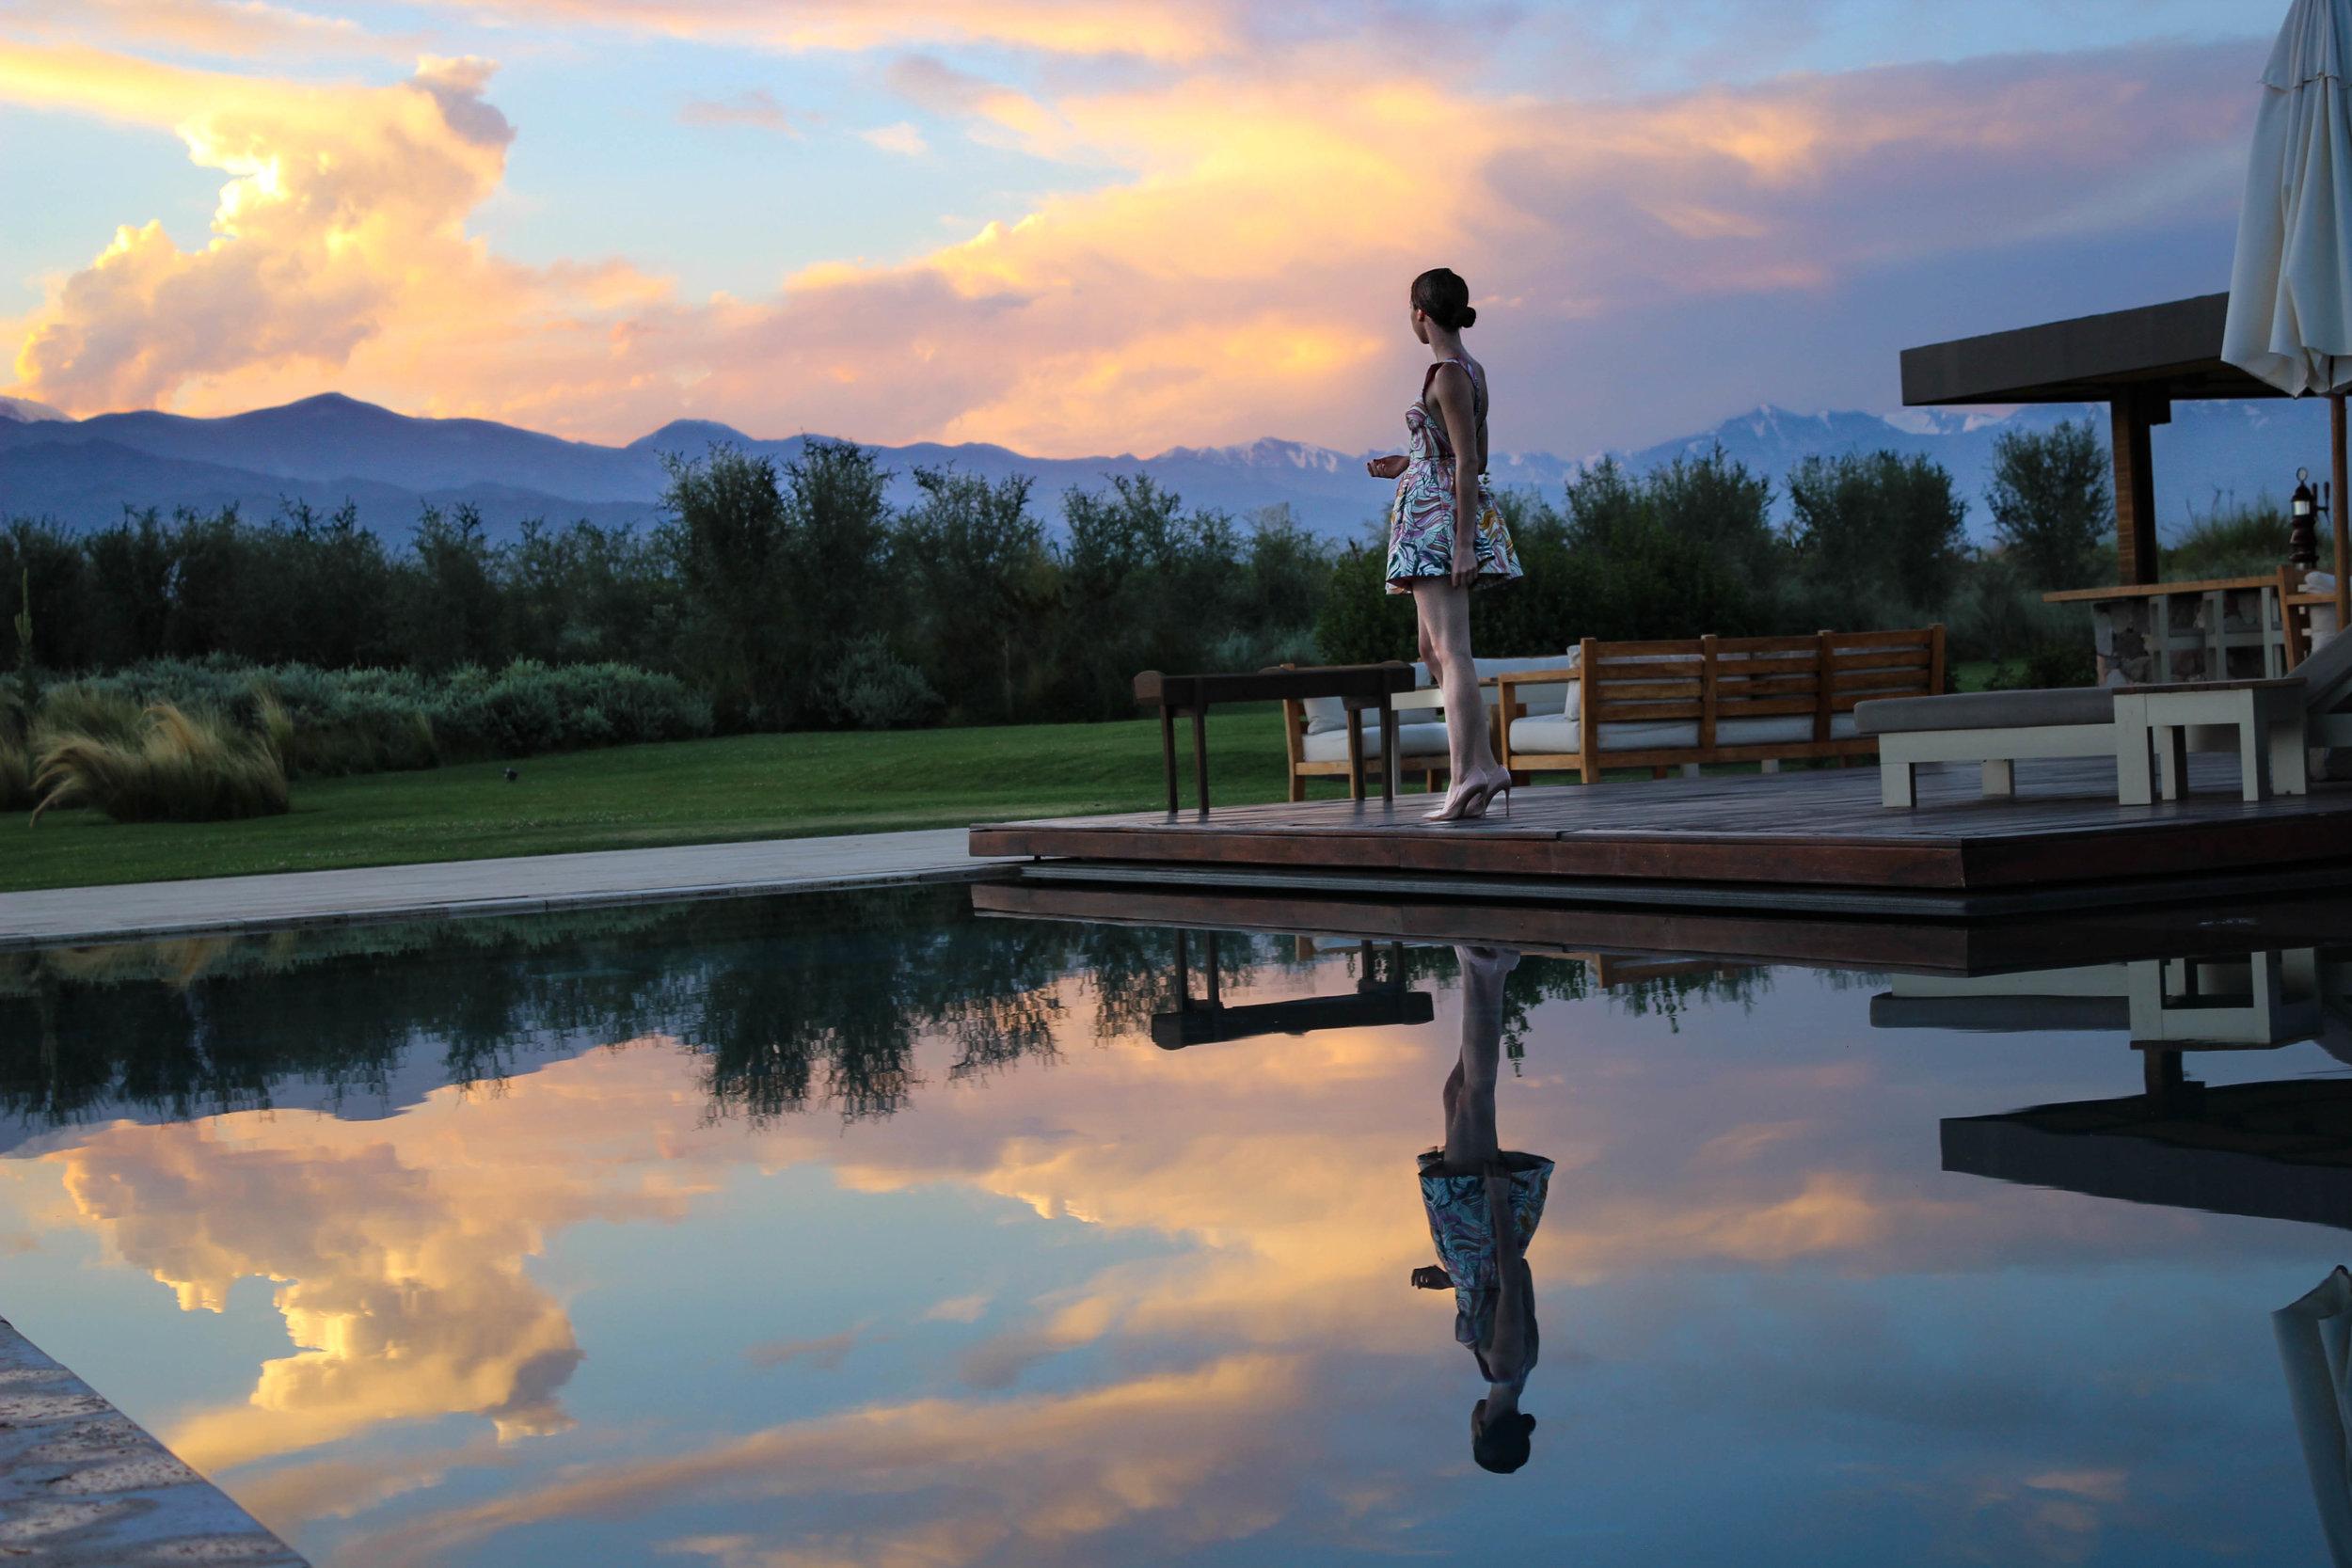 THE VINES OF MENDOZA LUXURY HOTEL VIDEO SERIES